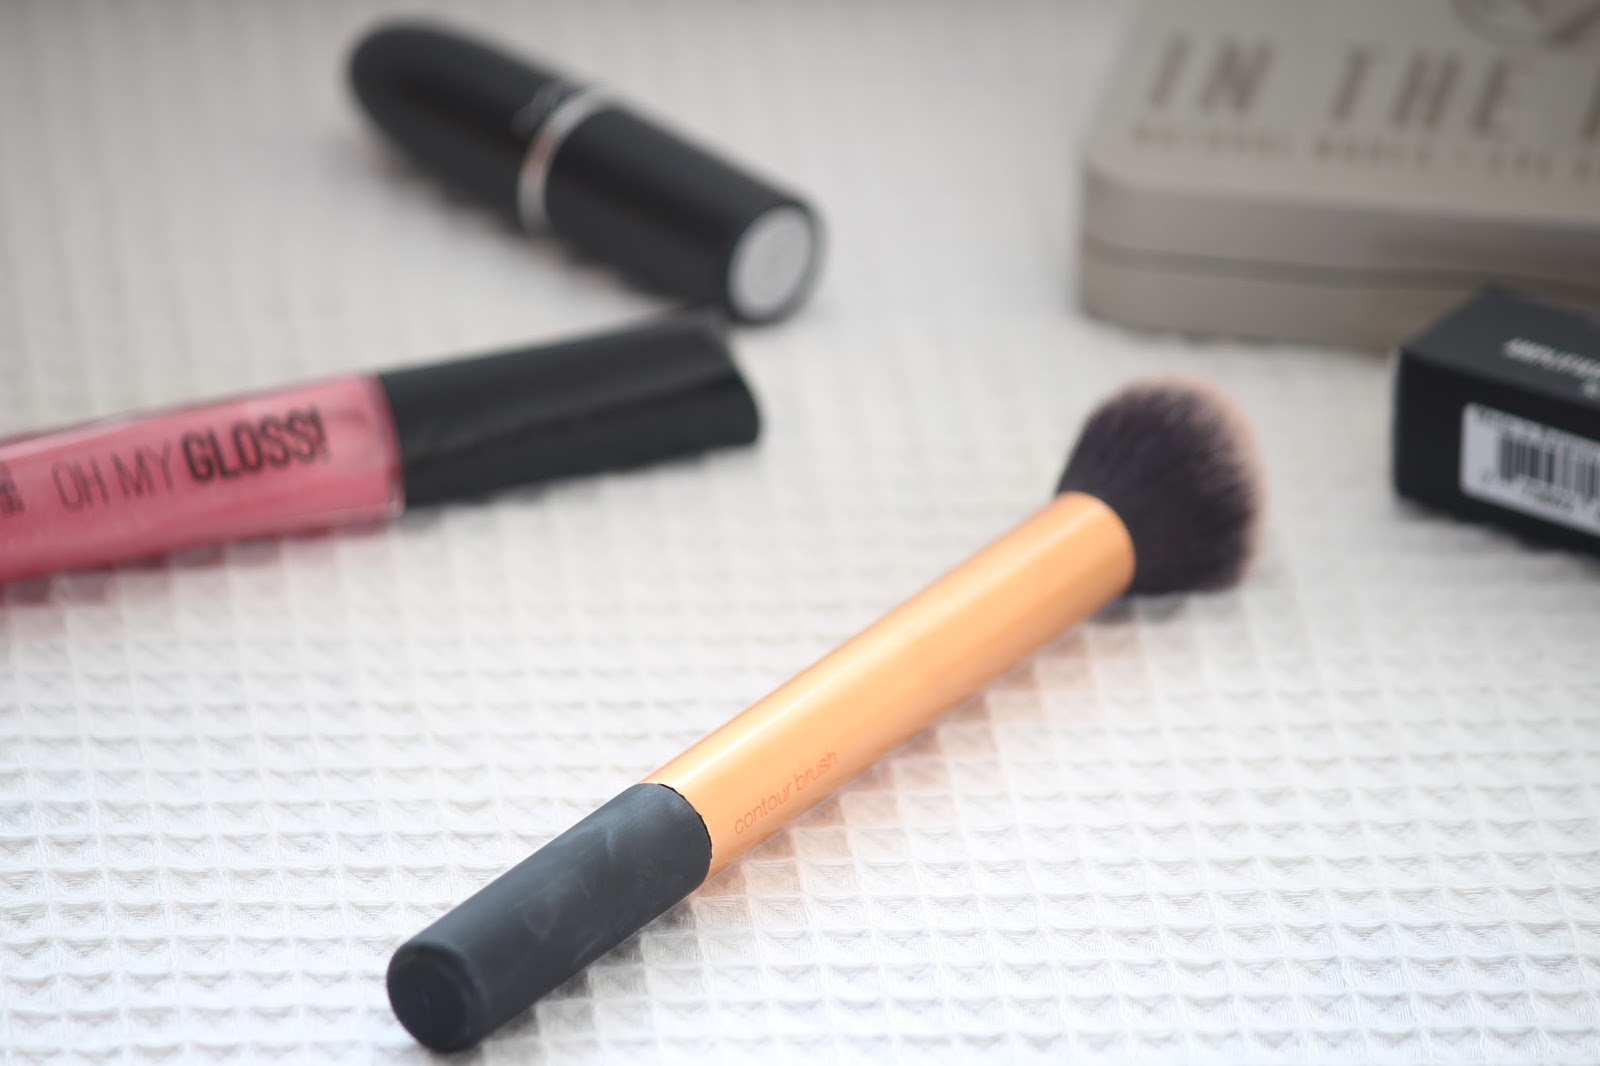 real Technics contour brush review cheap UK